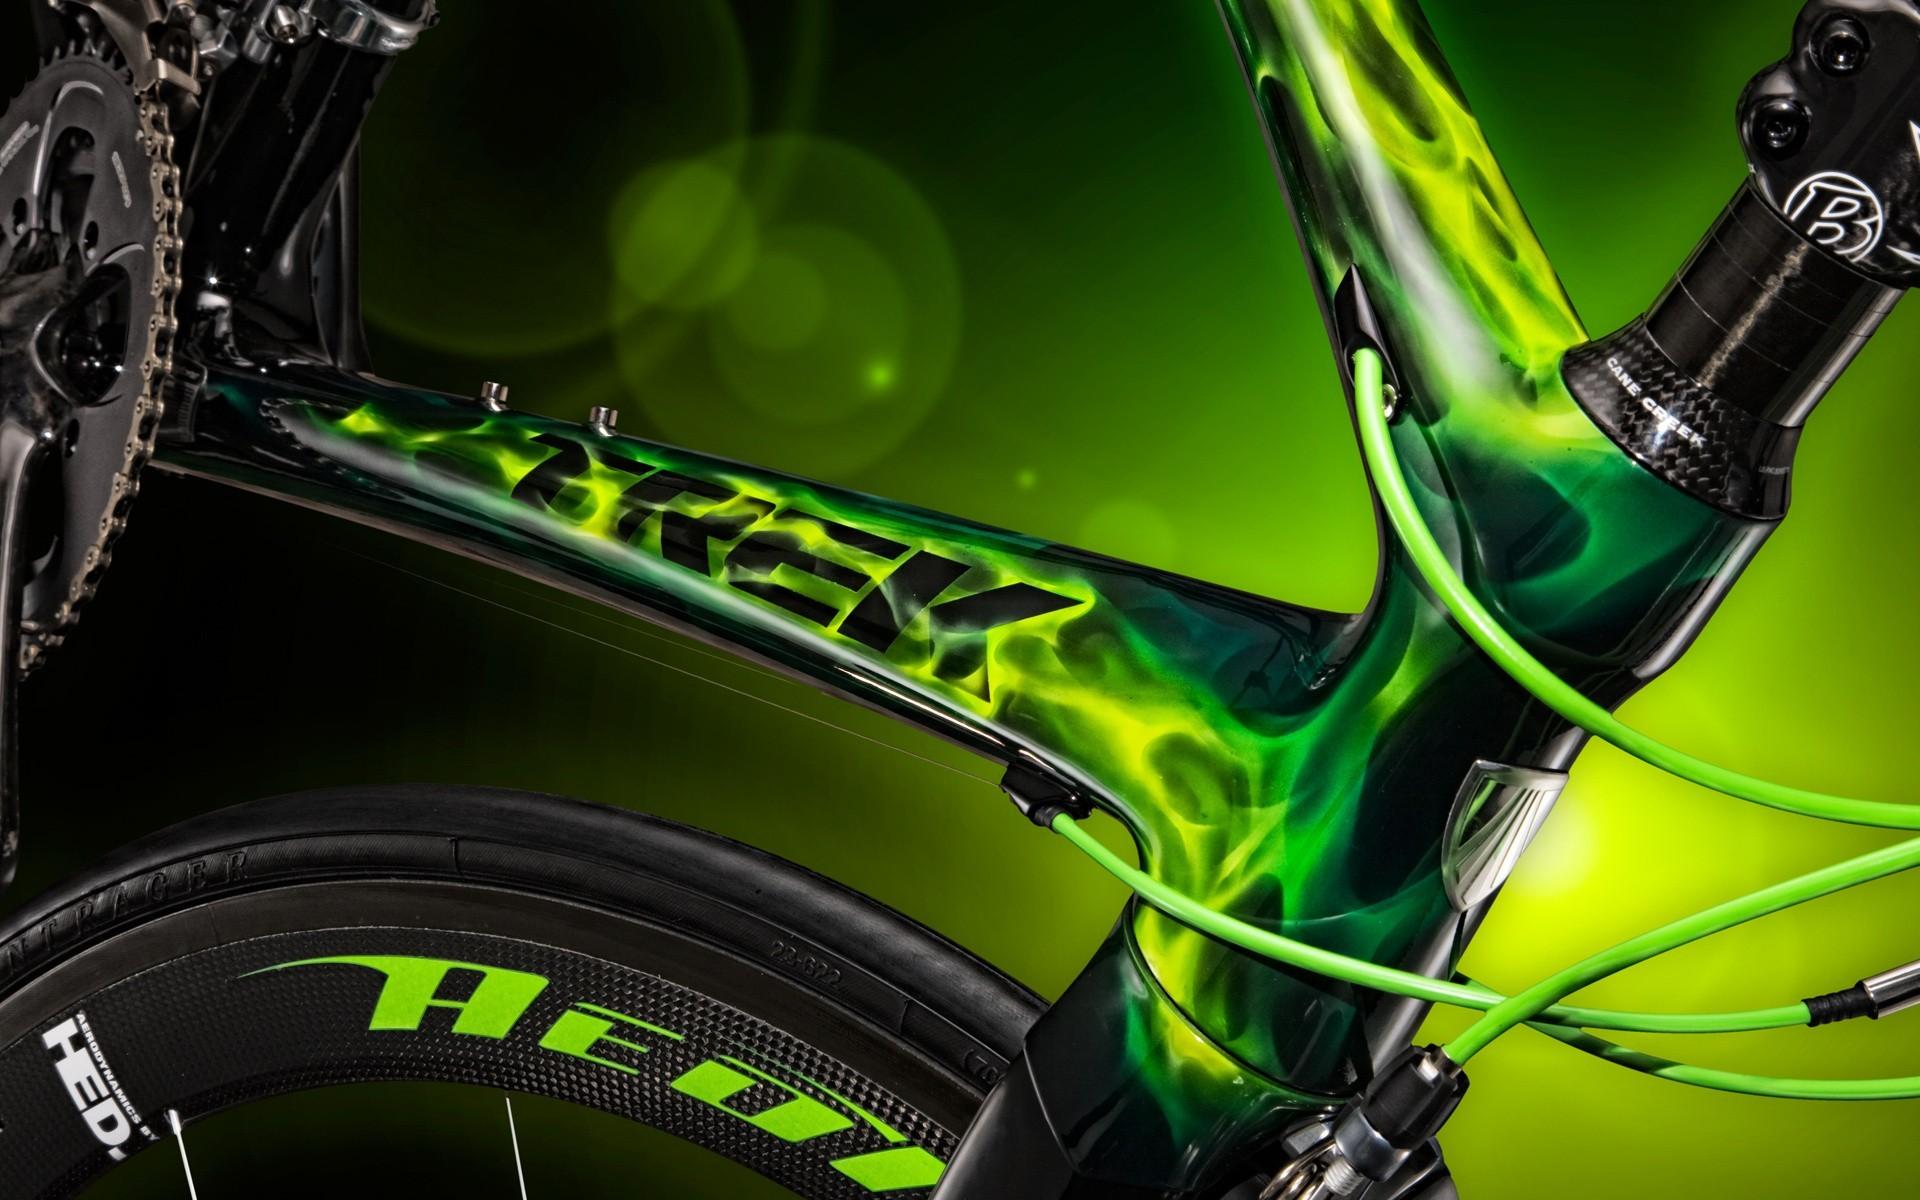 Trek Bike Wallpapers, Green Trek Bike Myspace Backgrounds, Green Trek .